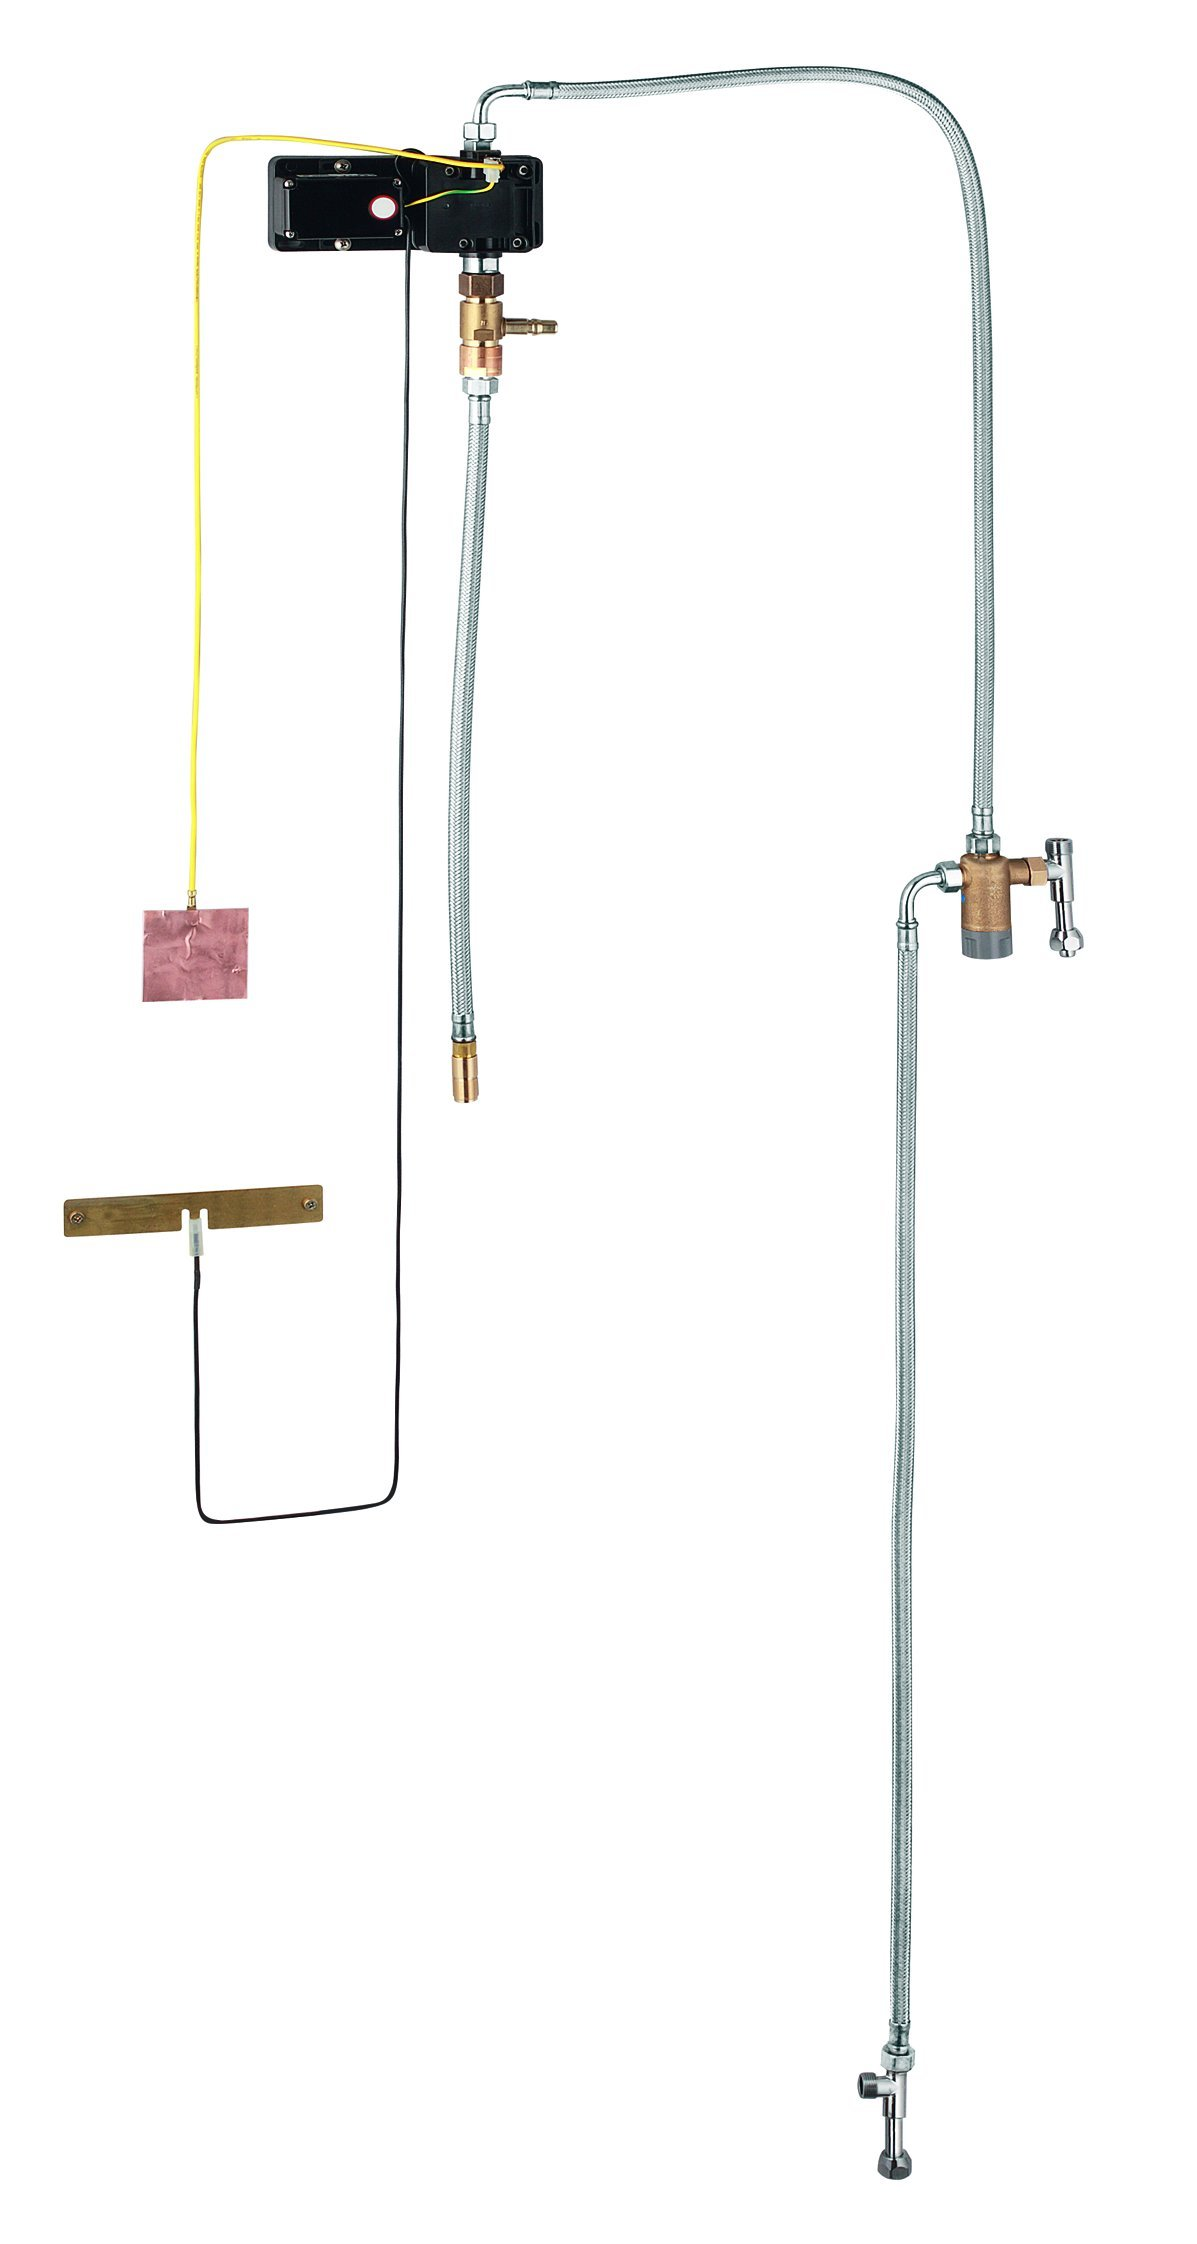 2465051-Grohe-umrust-Set-1-pezzi-30309000 miniatura 2